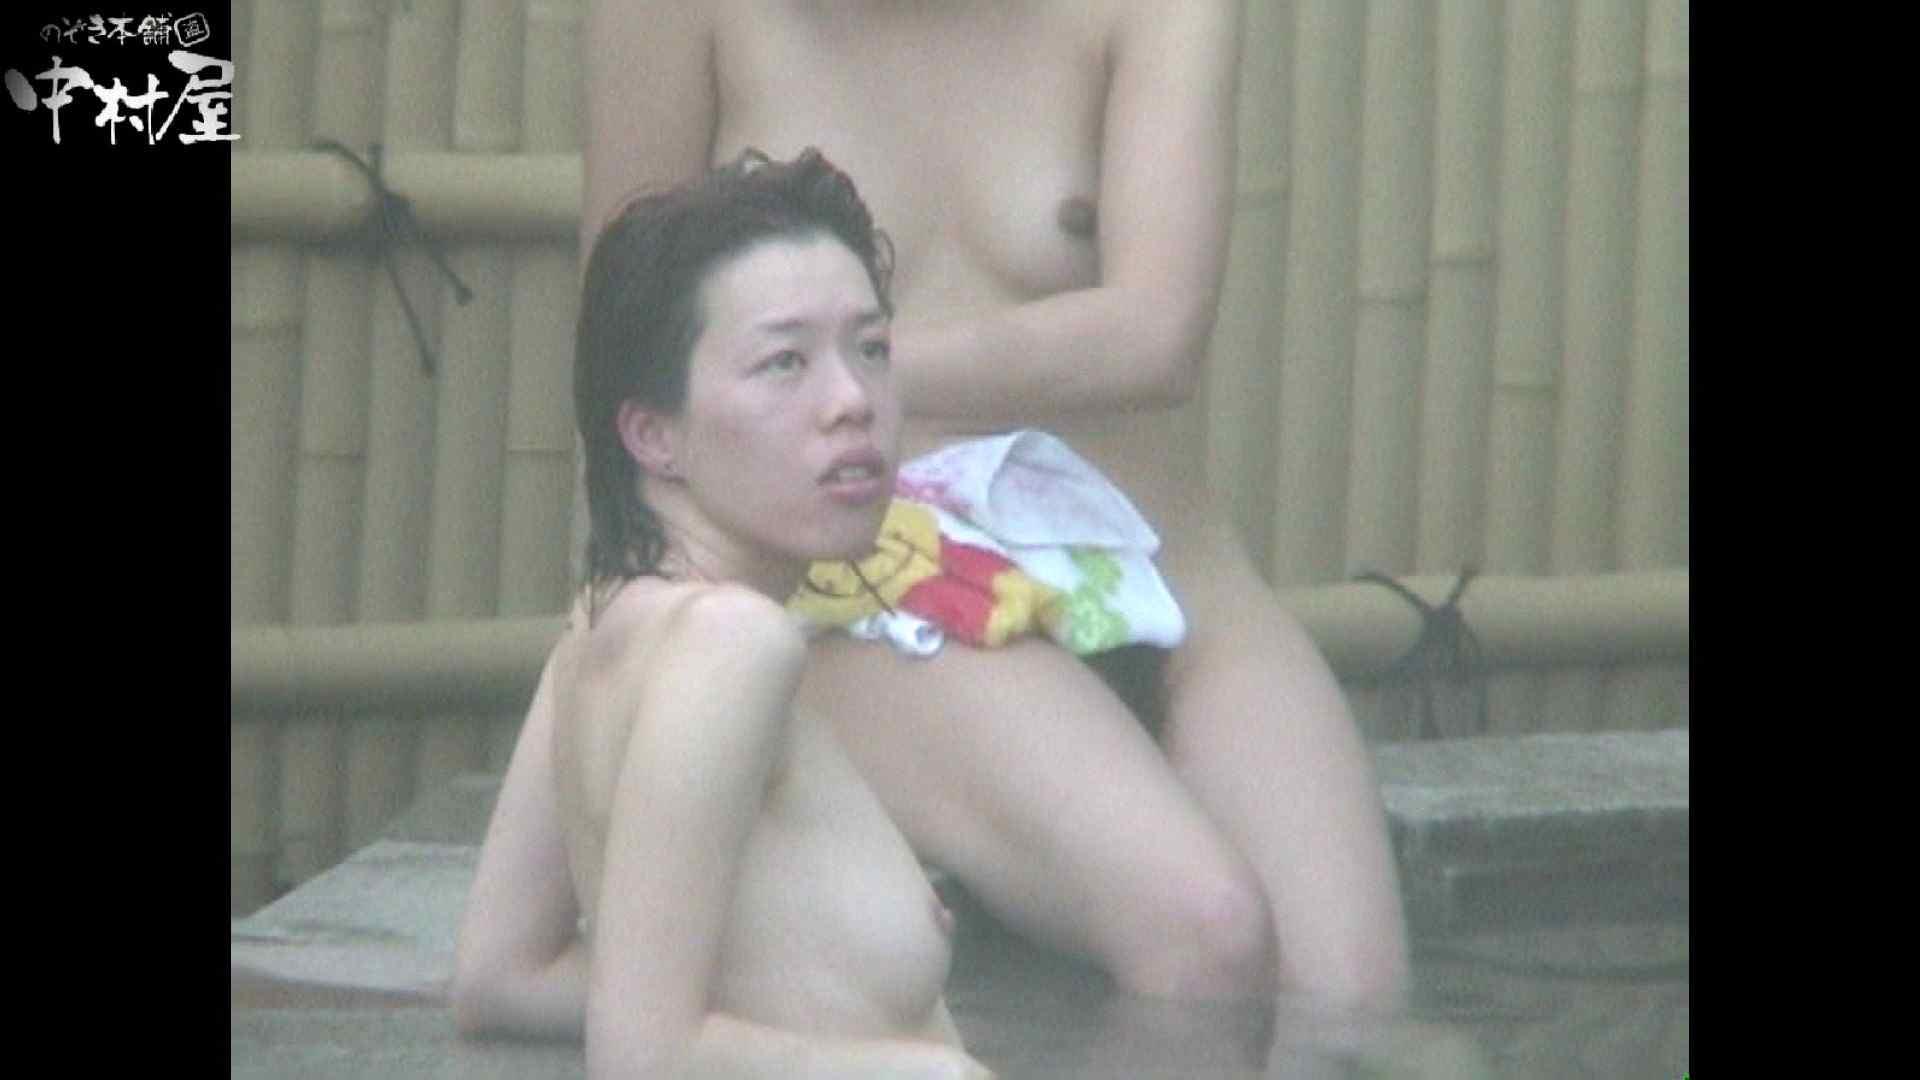 Aquaな露天風呂Vol.932 盗撮師作品 | 露天風呂突入  106pic 88